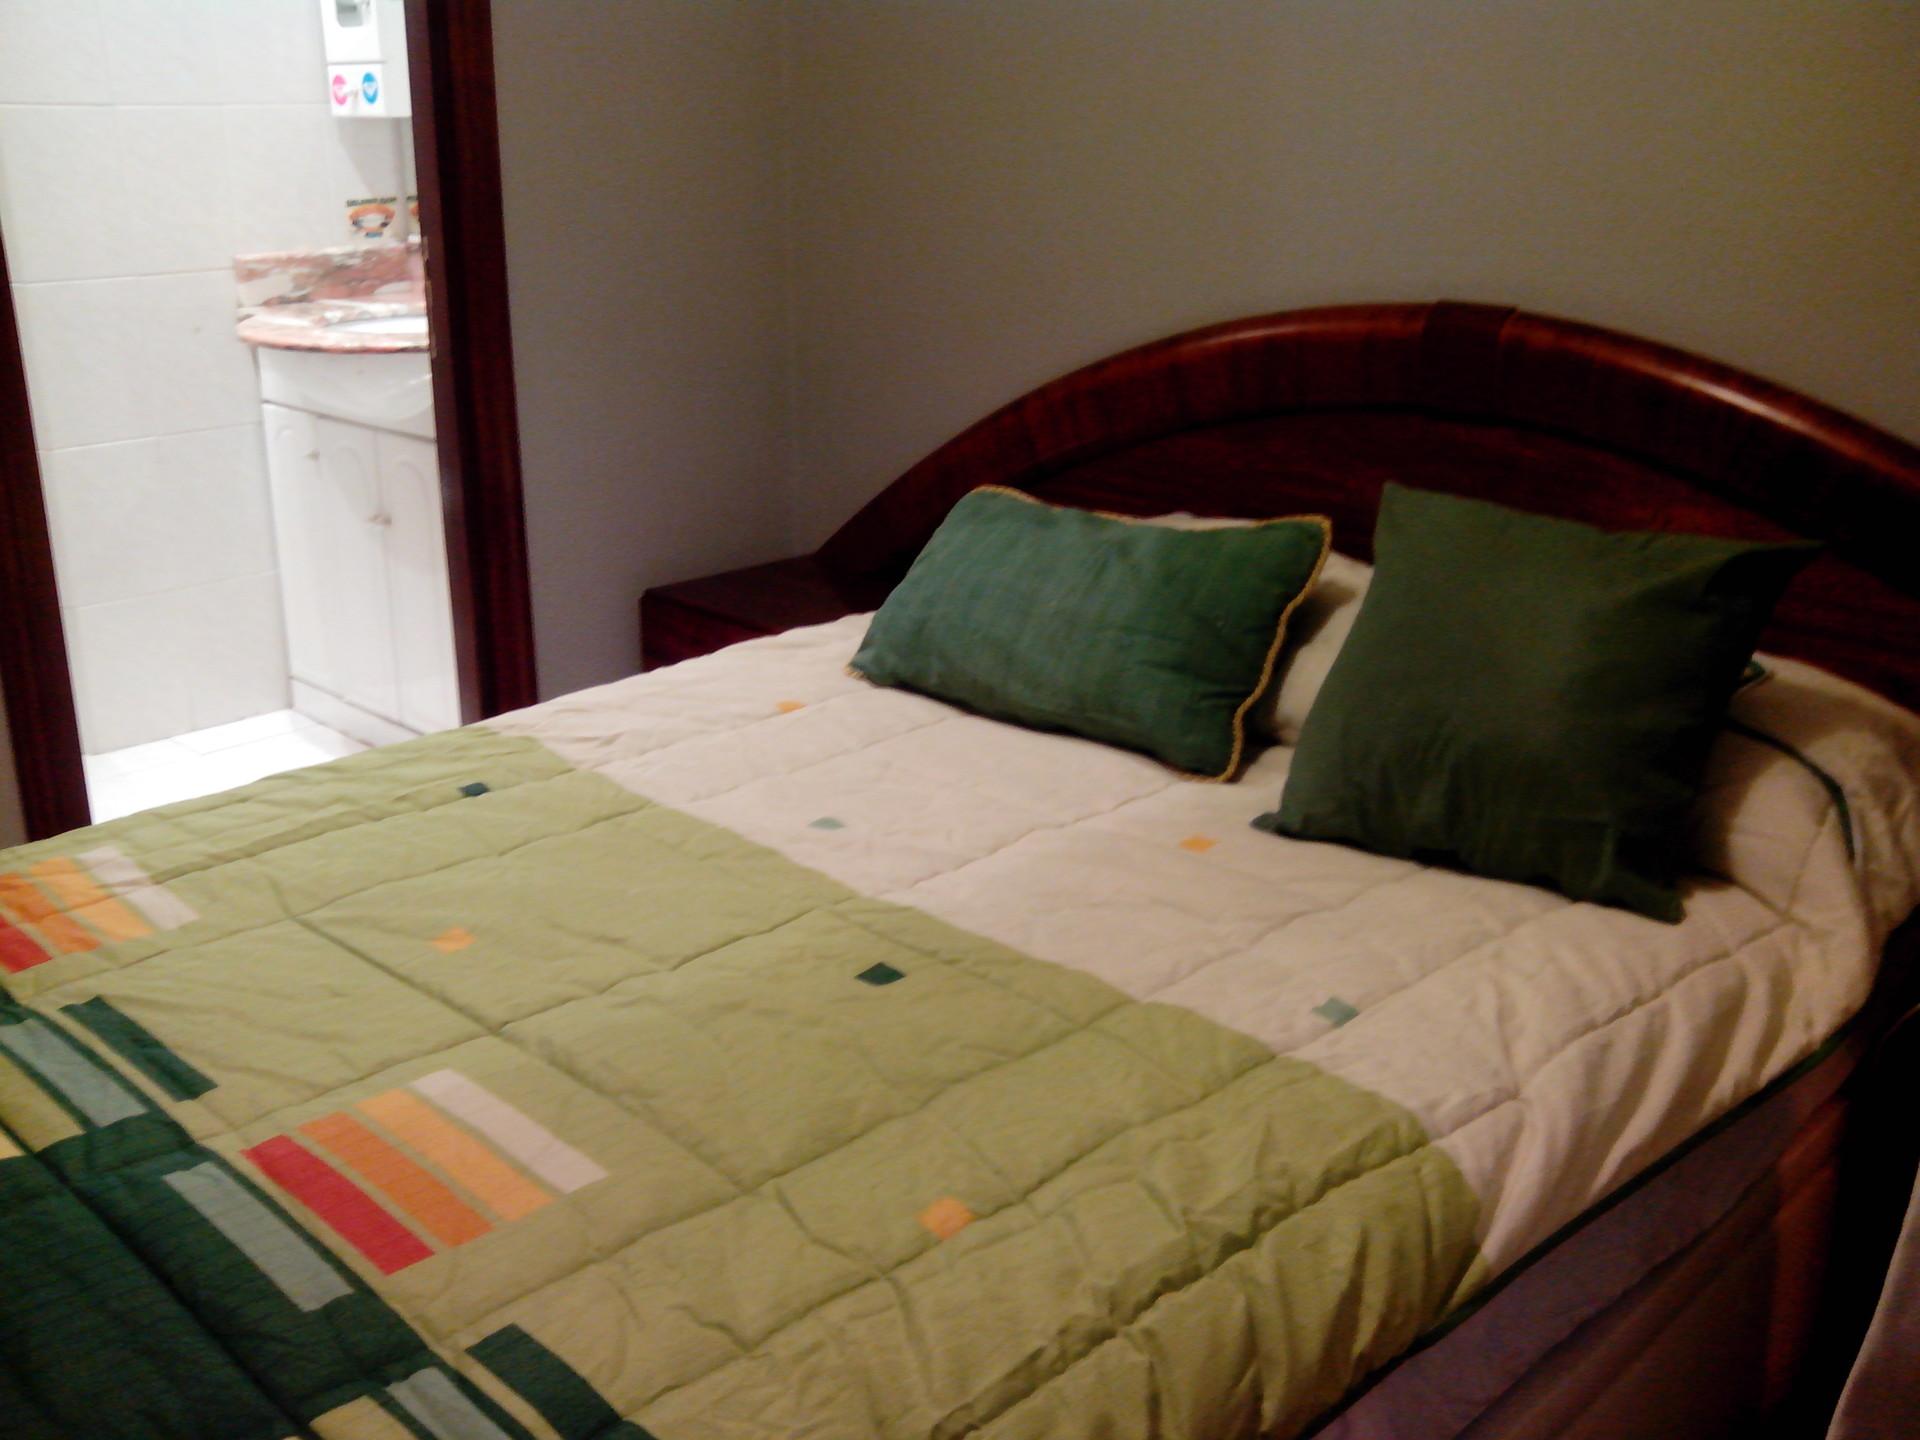 alquiler habitaciones en bilbao